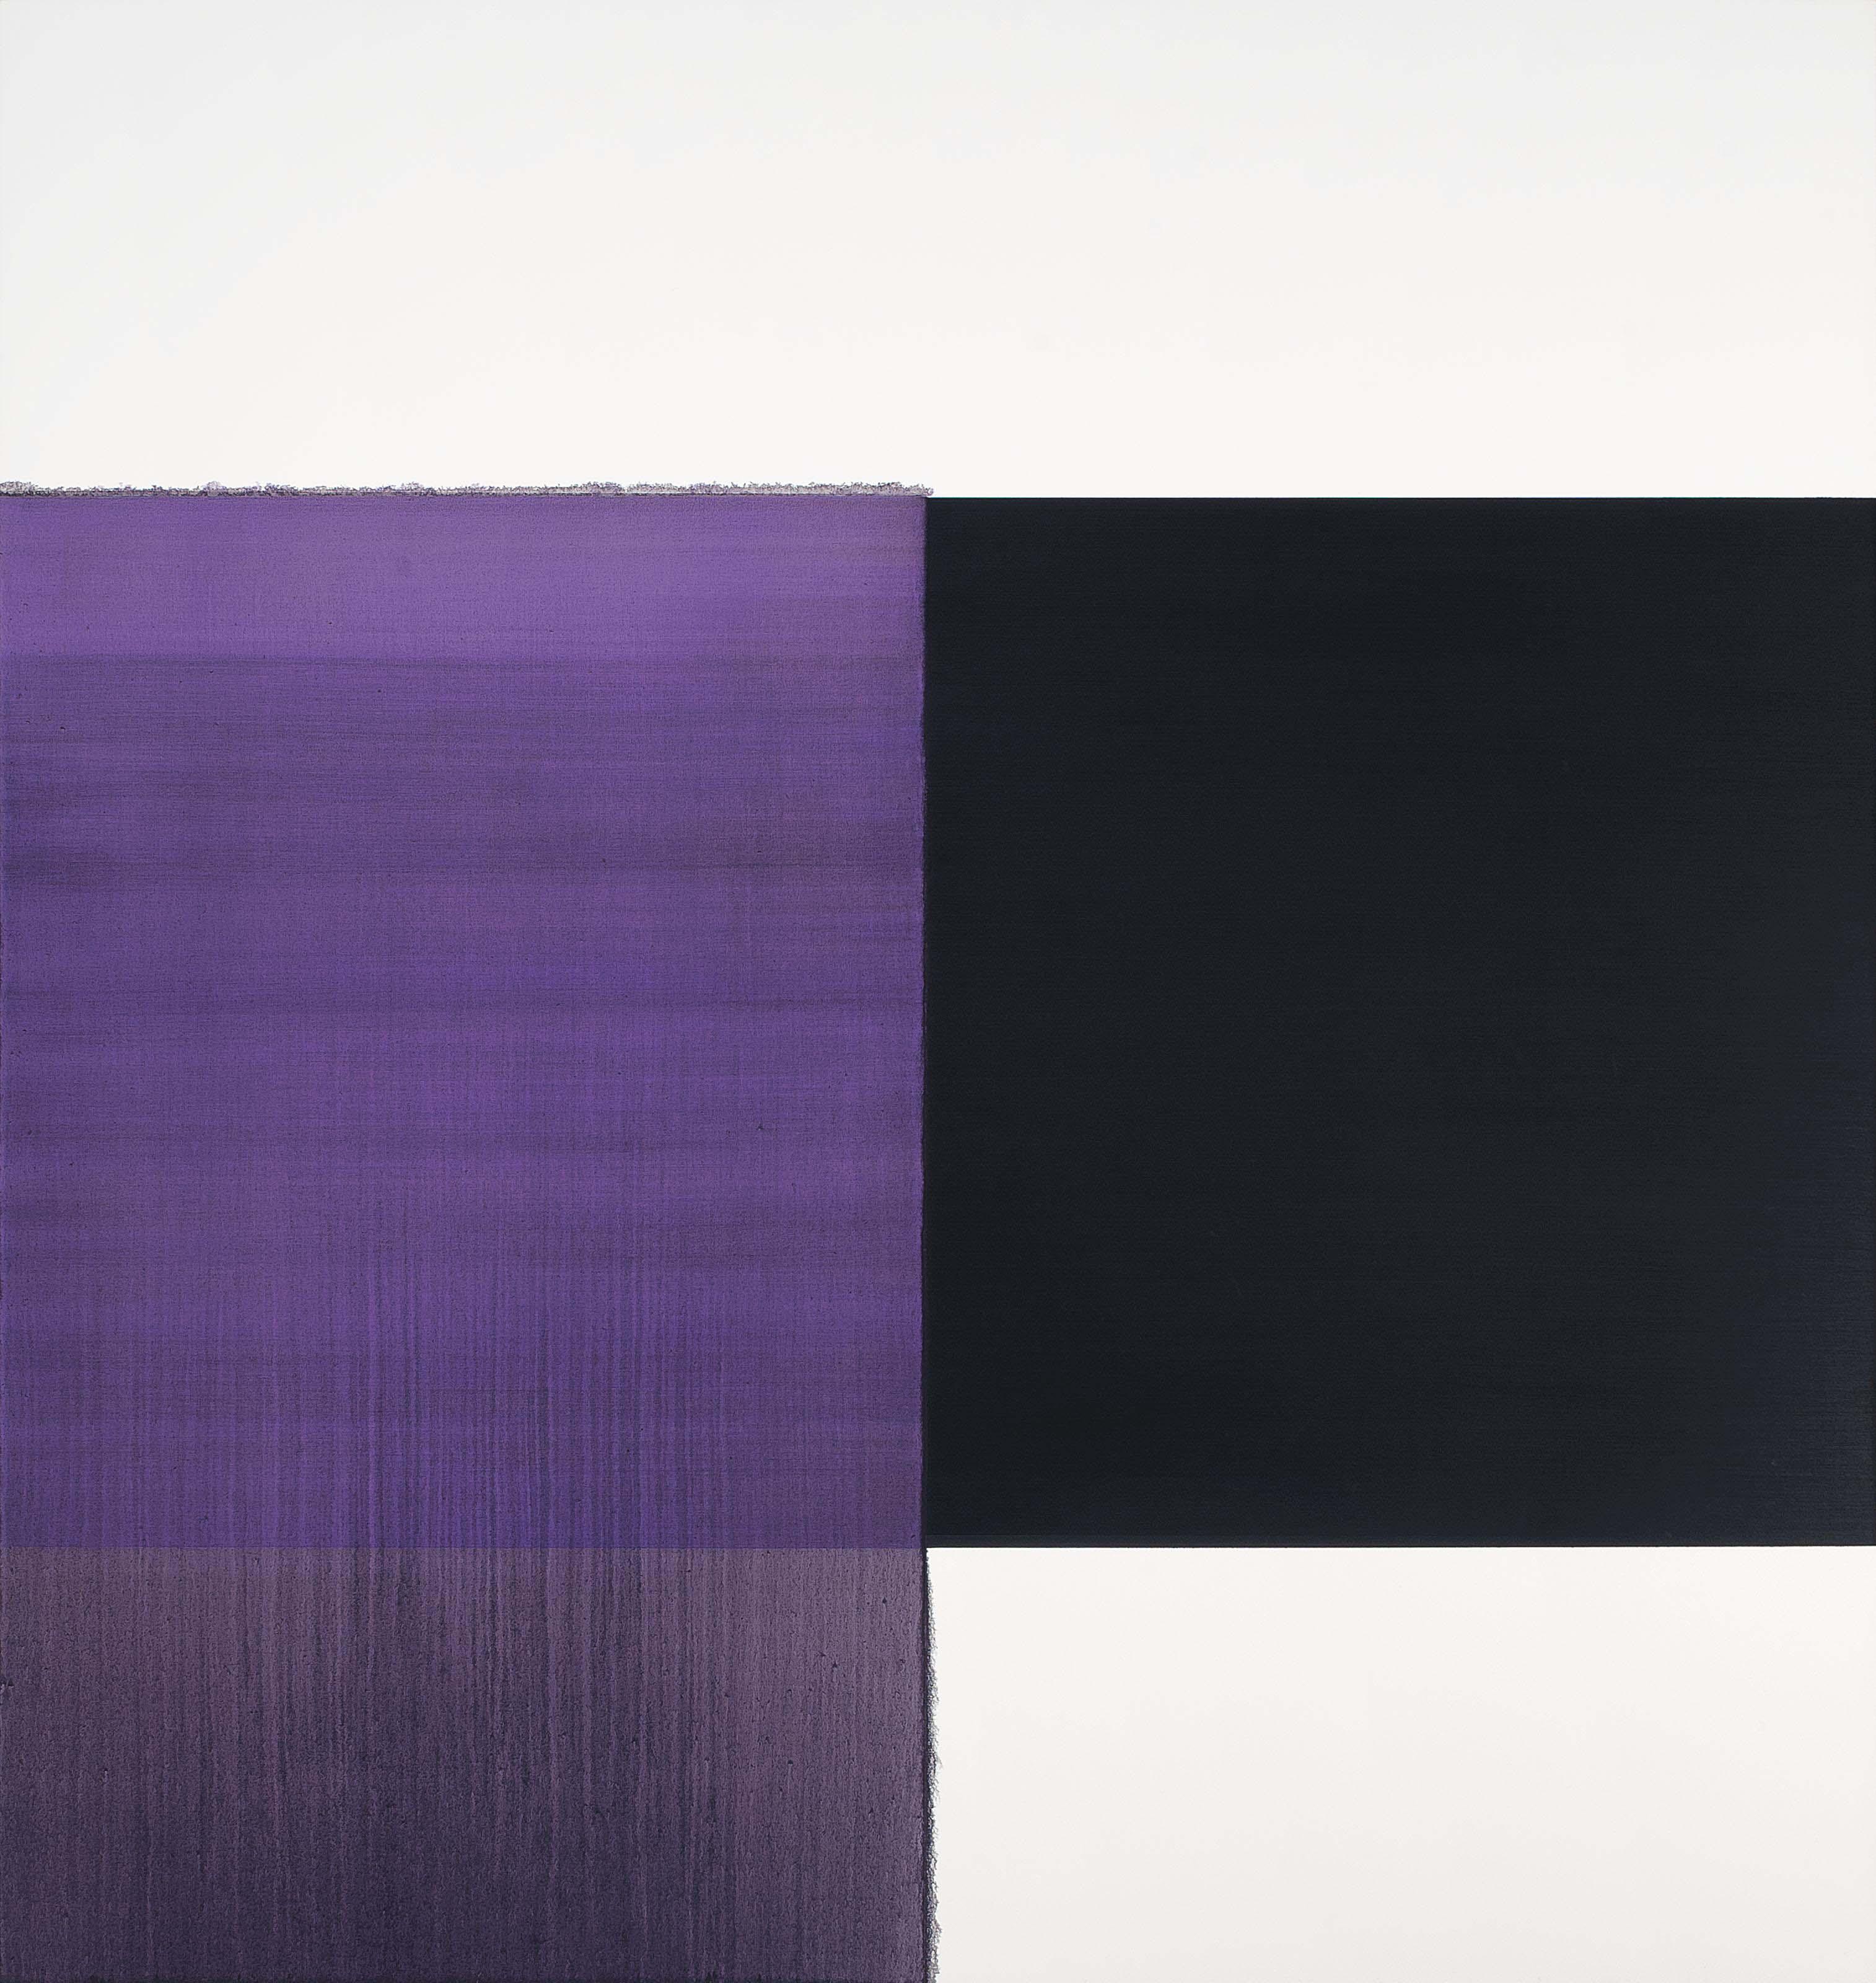 Exposed Painting Dioxazine Violet Scheveningen Black